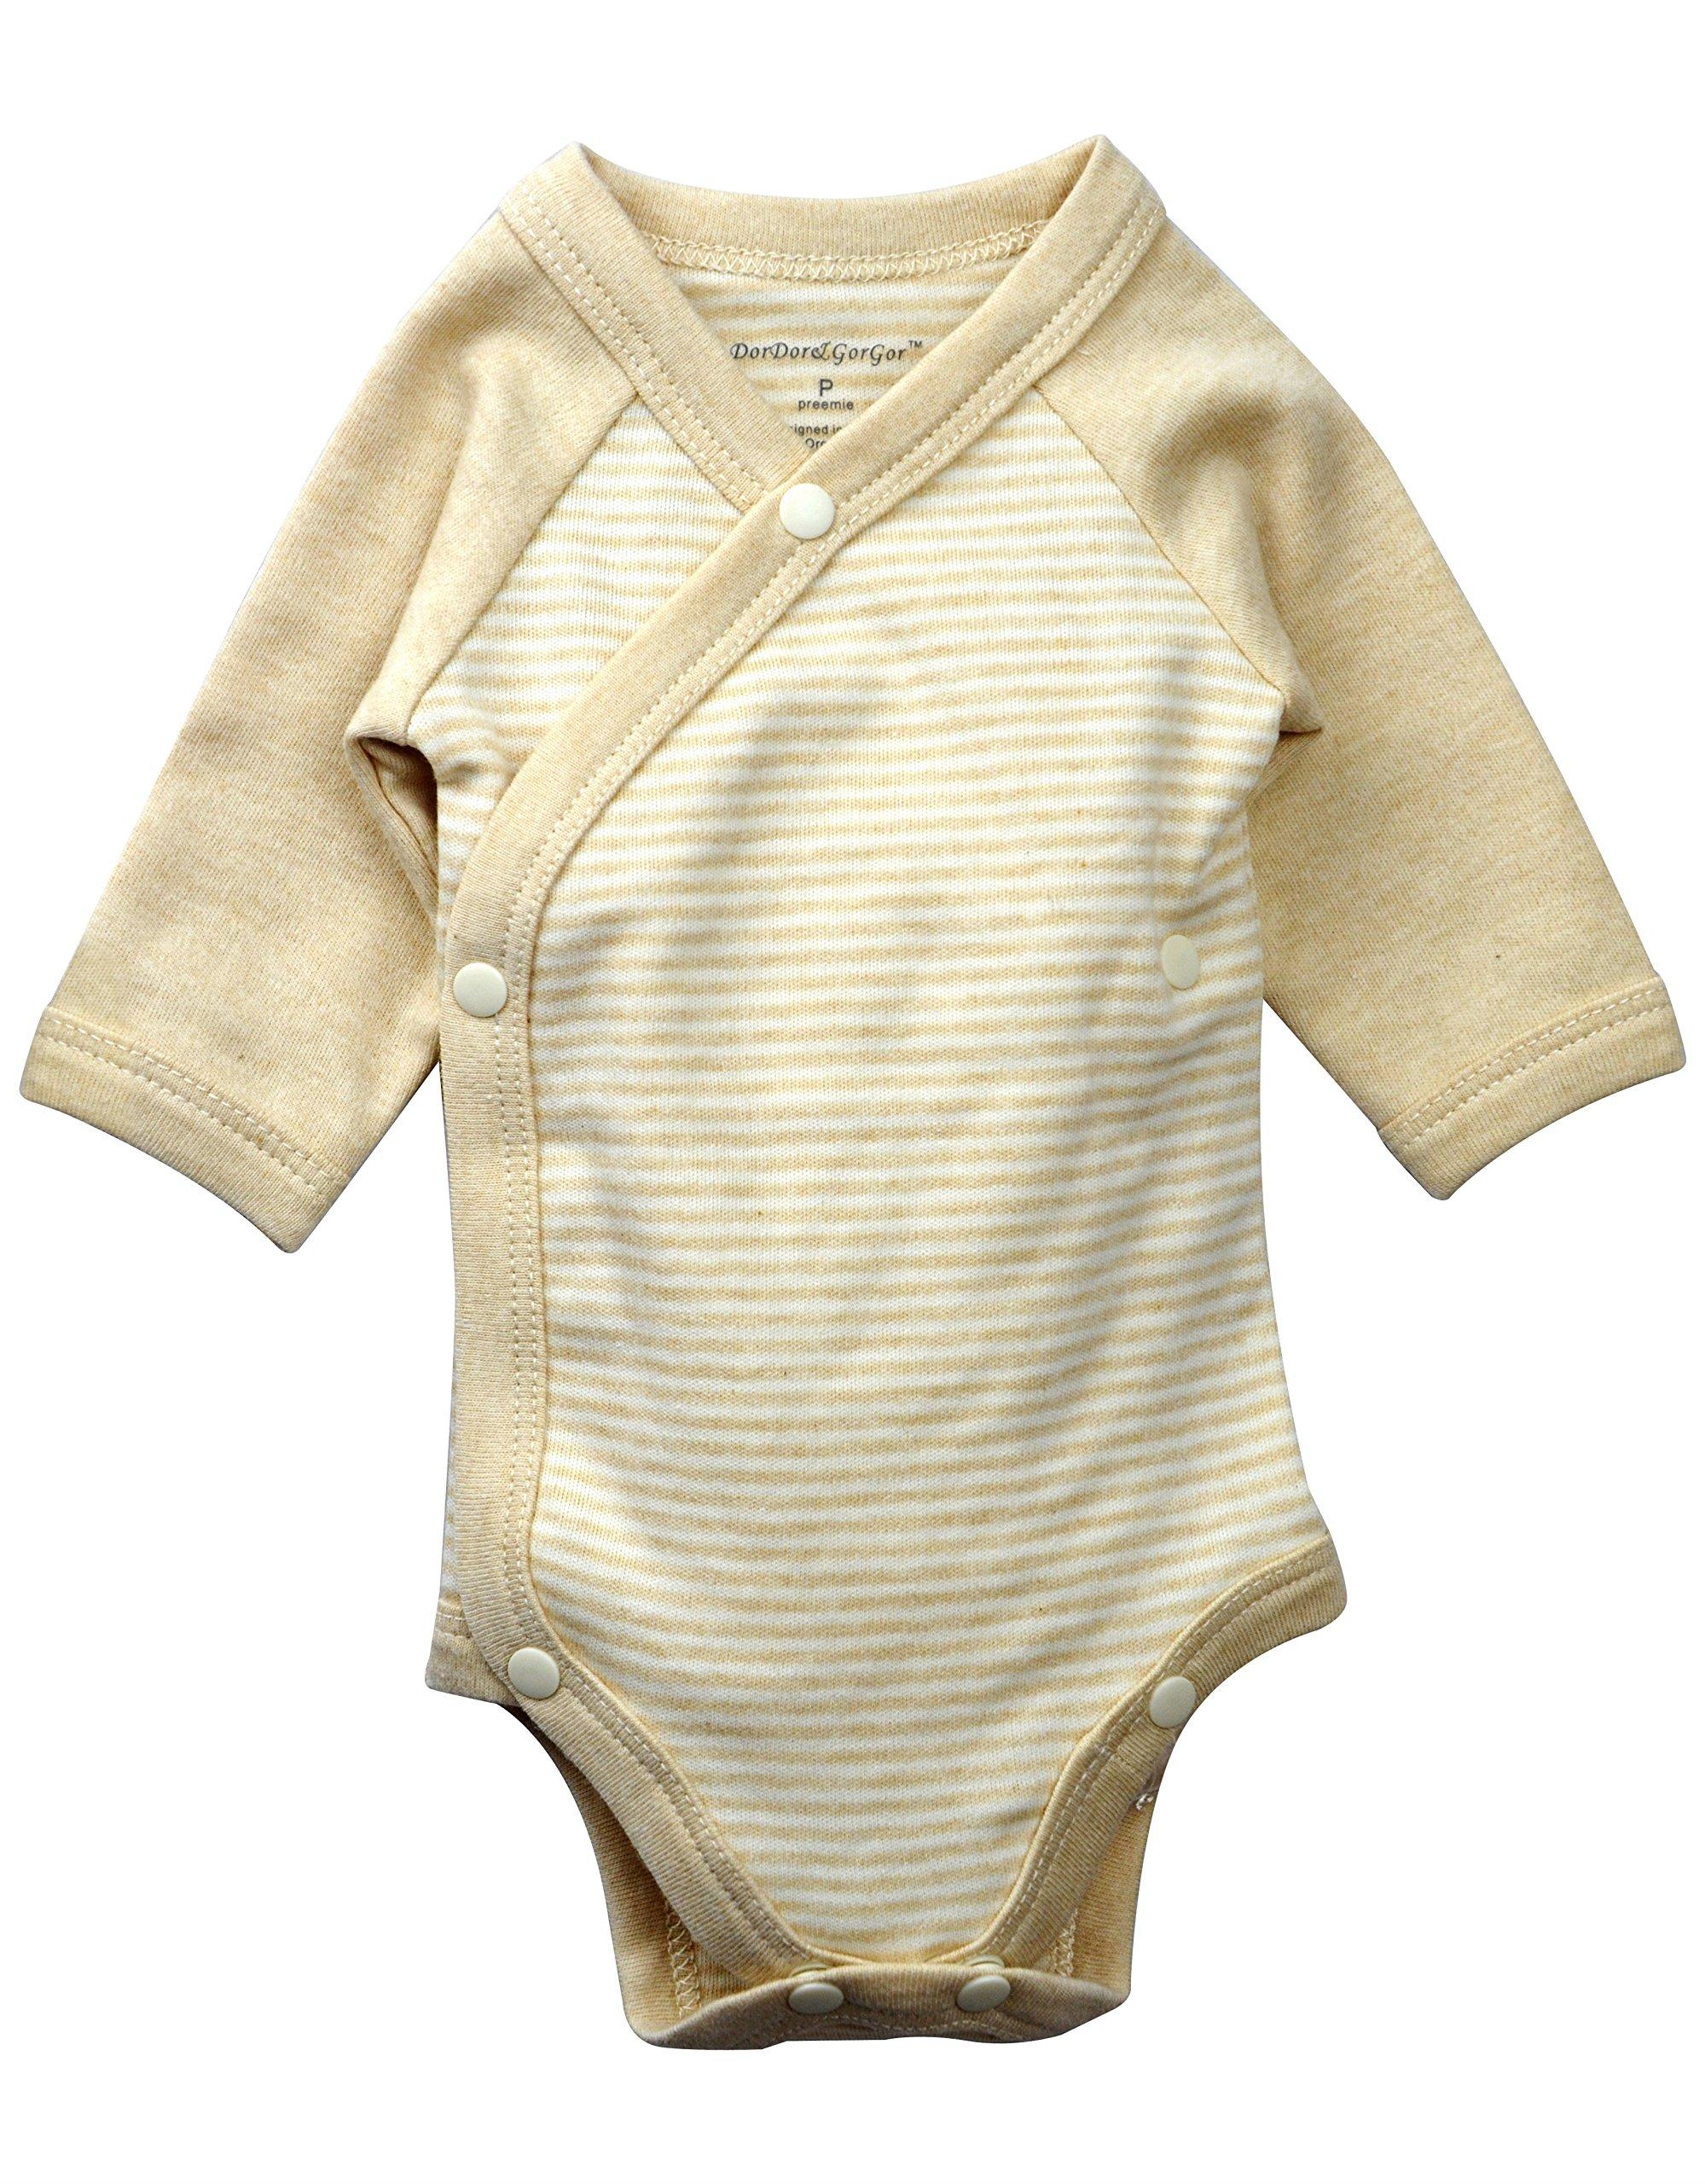 Dordor & Gorgor Baby Kimono Onesies, Organic Cotton